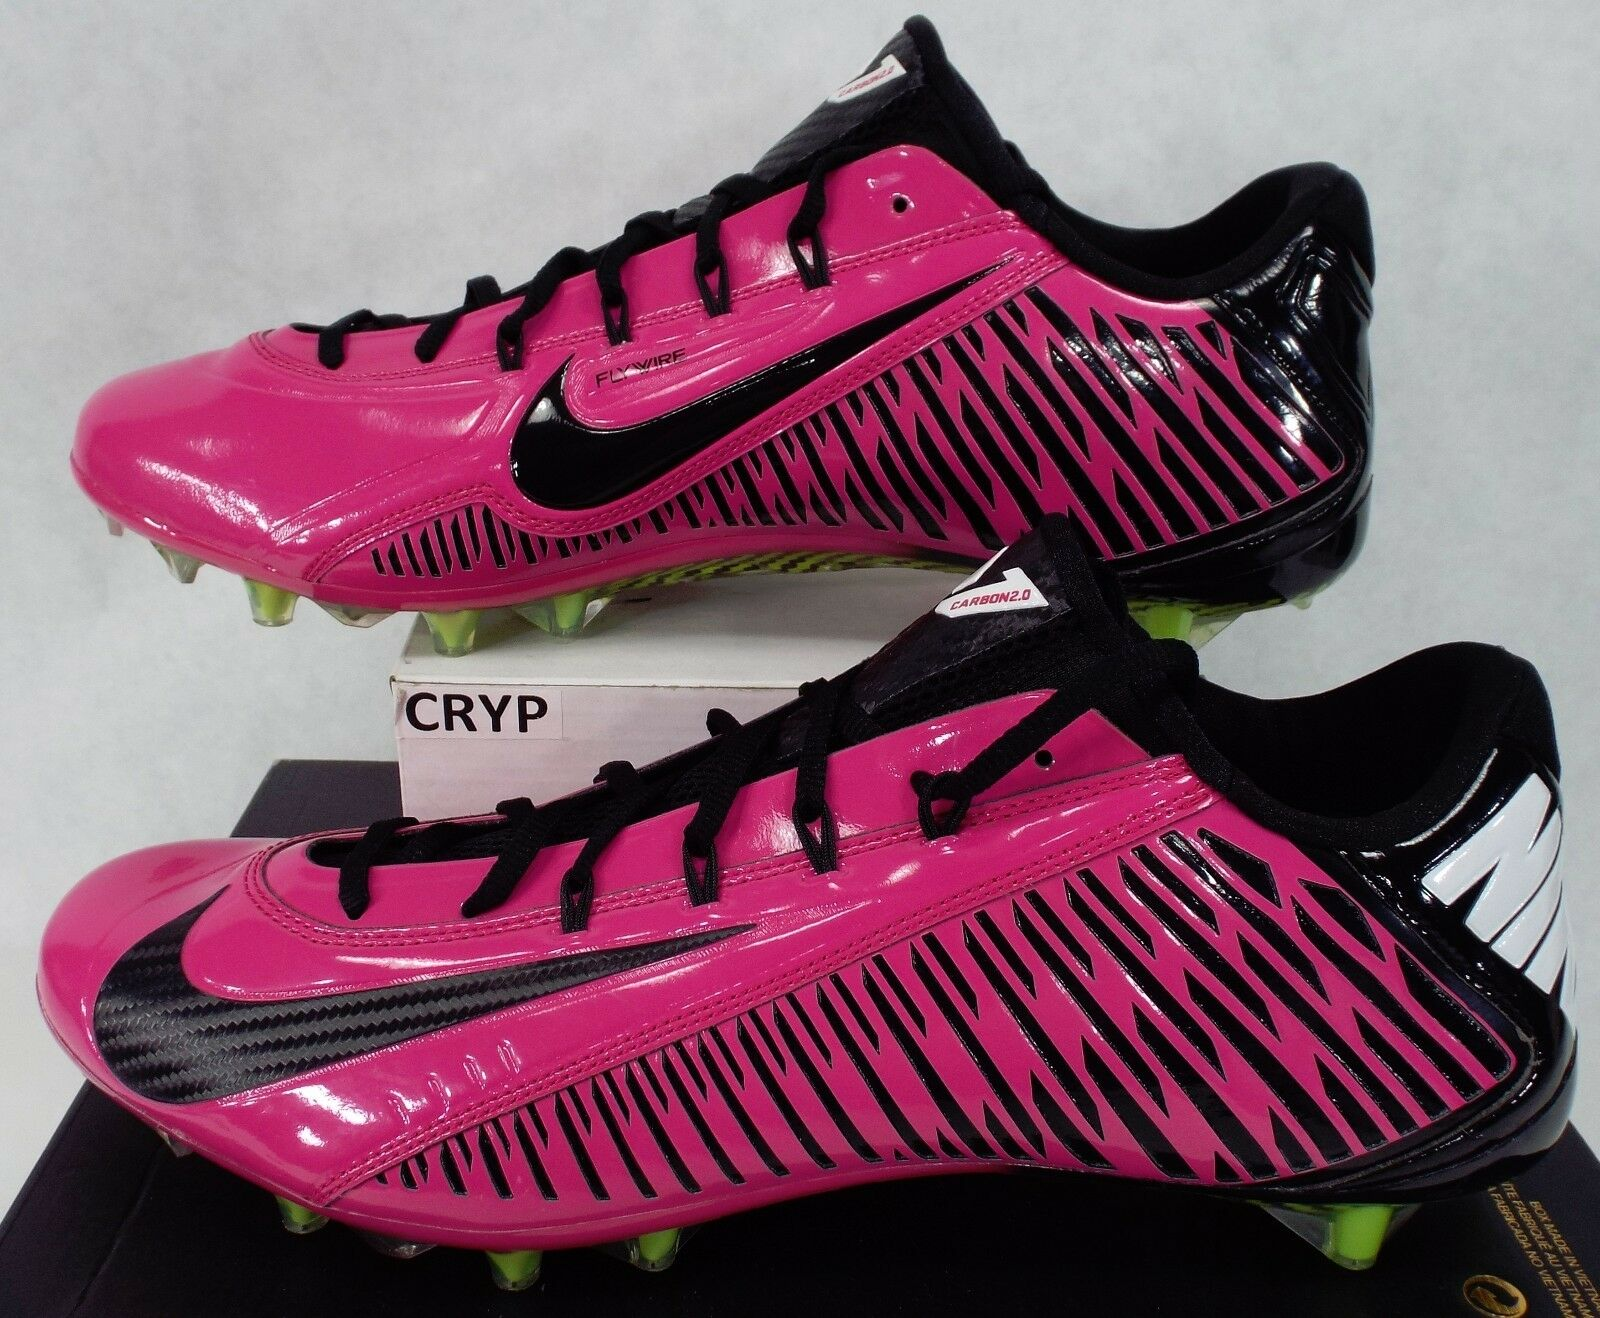 New   Herren 14.5 TD NIKE Vapor Carbon Elite TD 14.5 Pink Cancer Cleats Schuhes160 695504-610 00c2cf